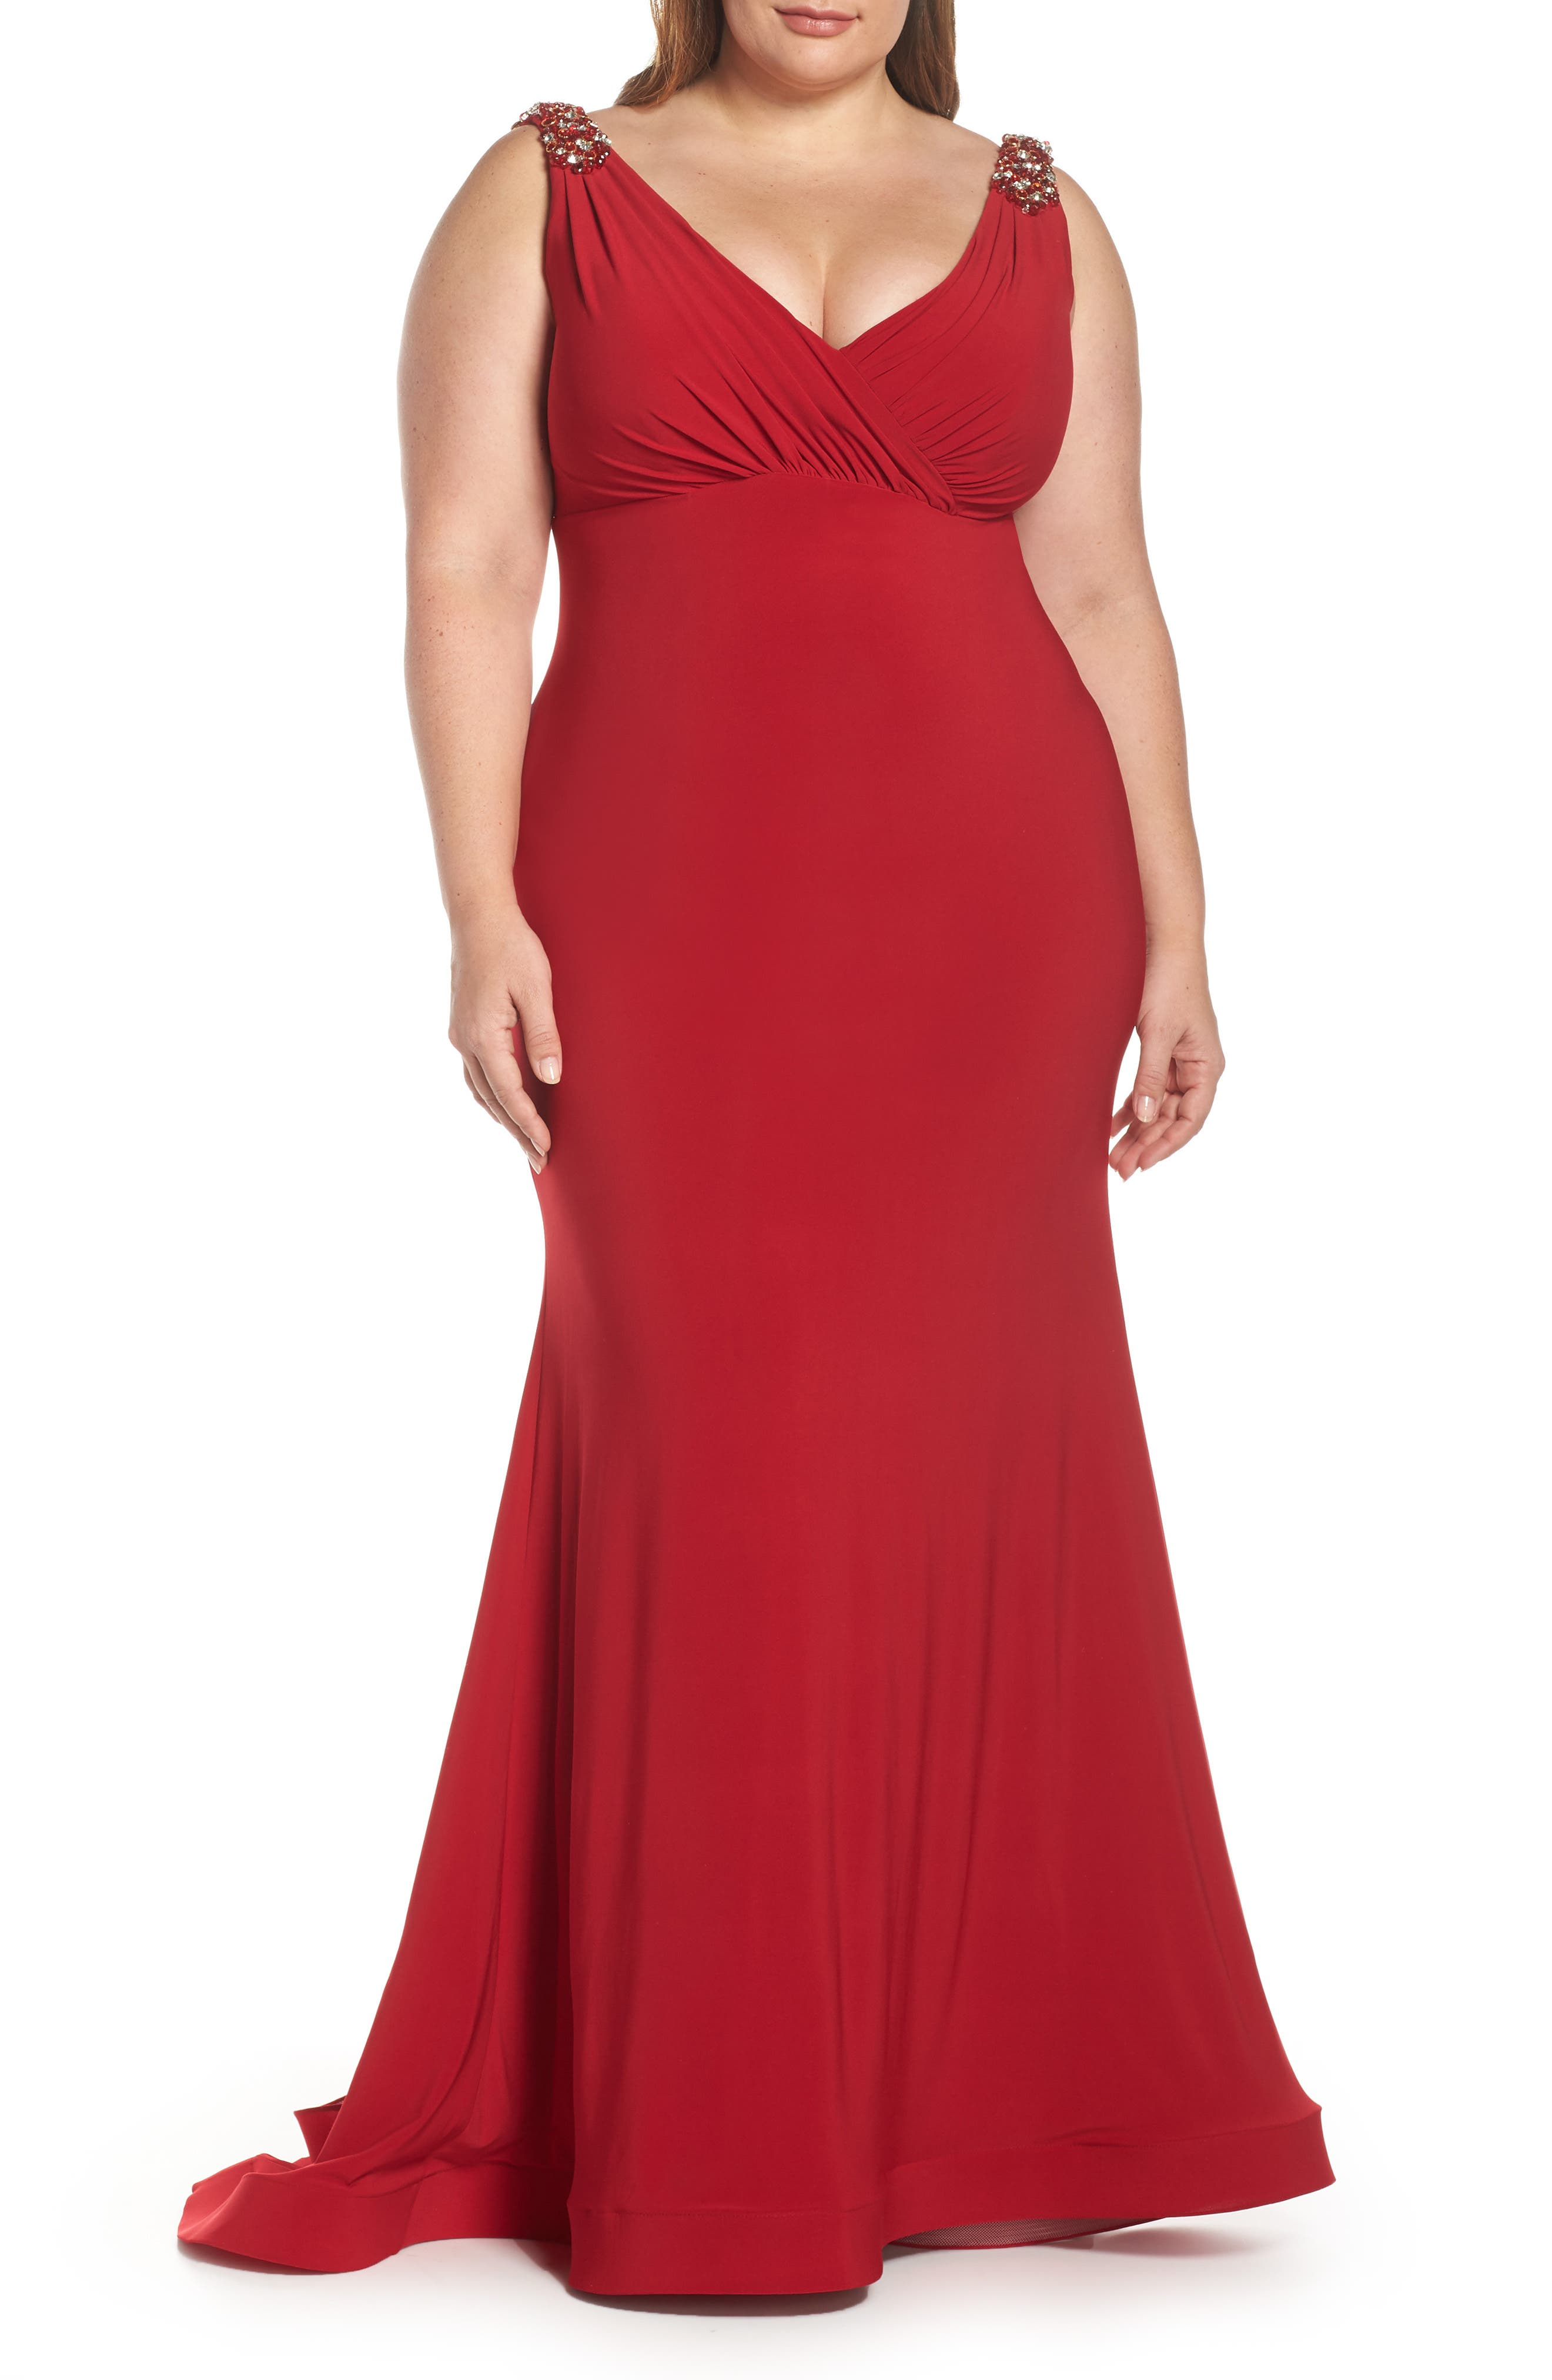 Plus Size MAC Duggal Embellished Trumpet Evening Dress, Red